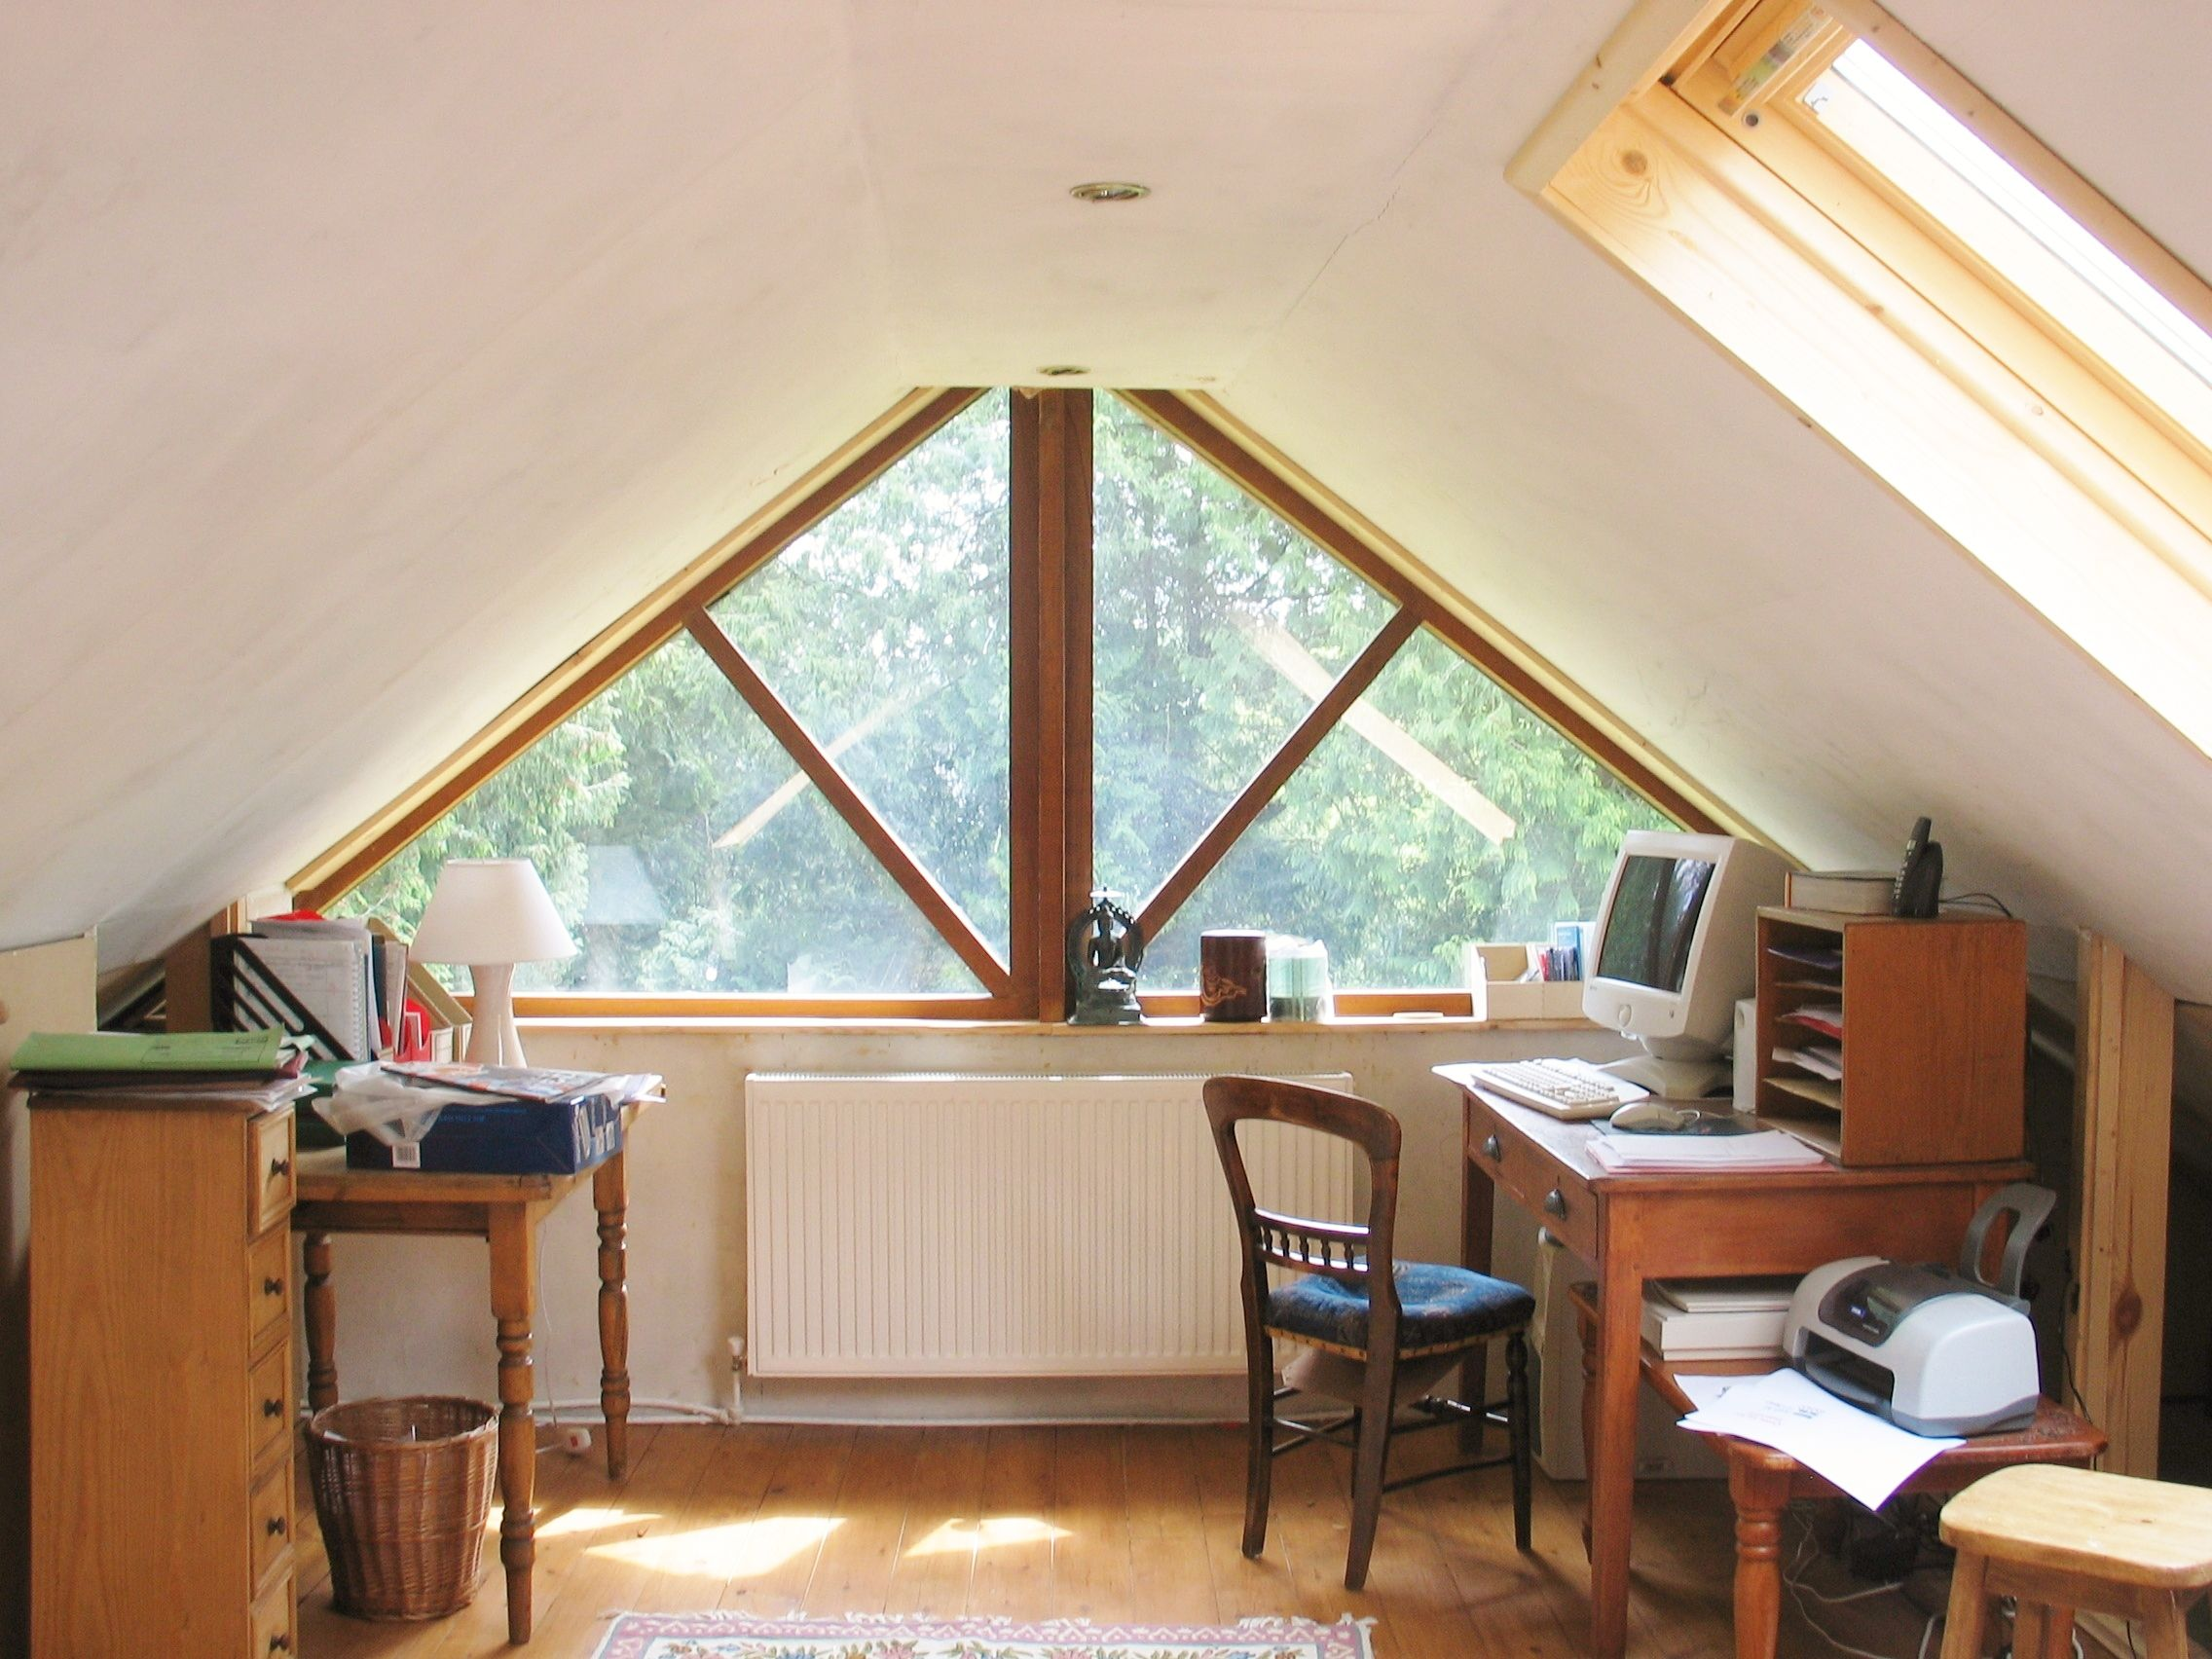 Gable End Window Google Search Gable Window Window Seat Design Loft Room